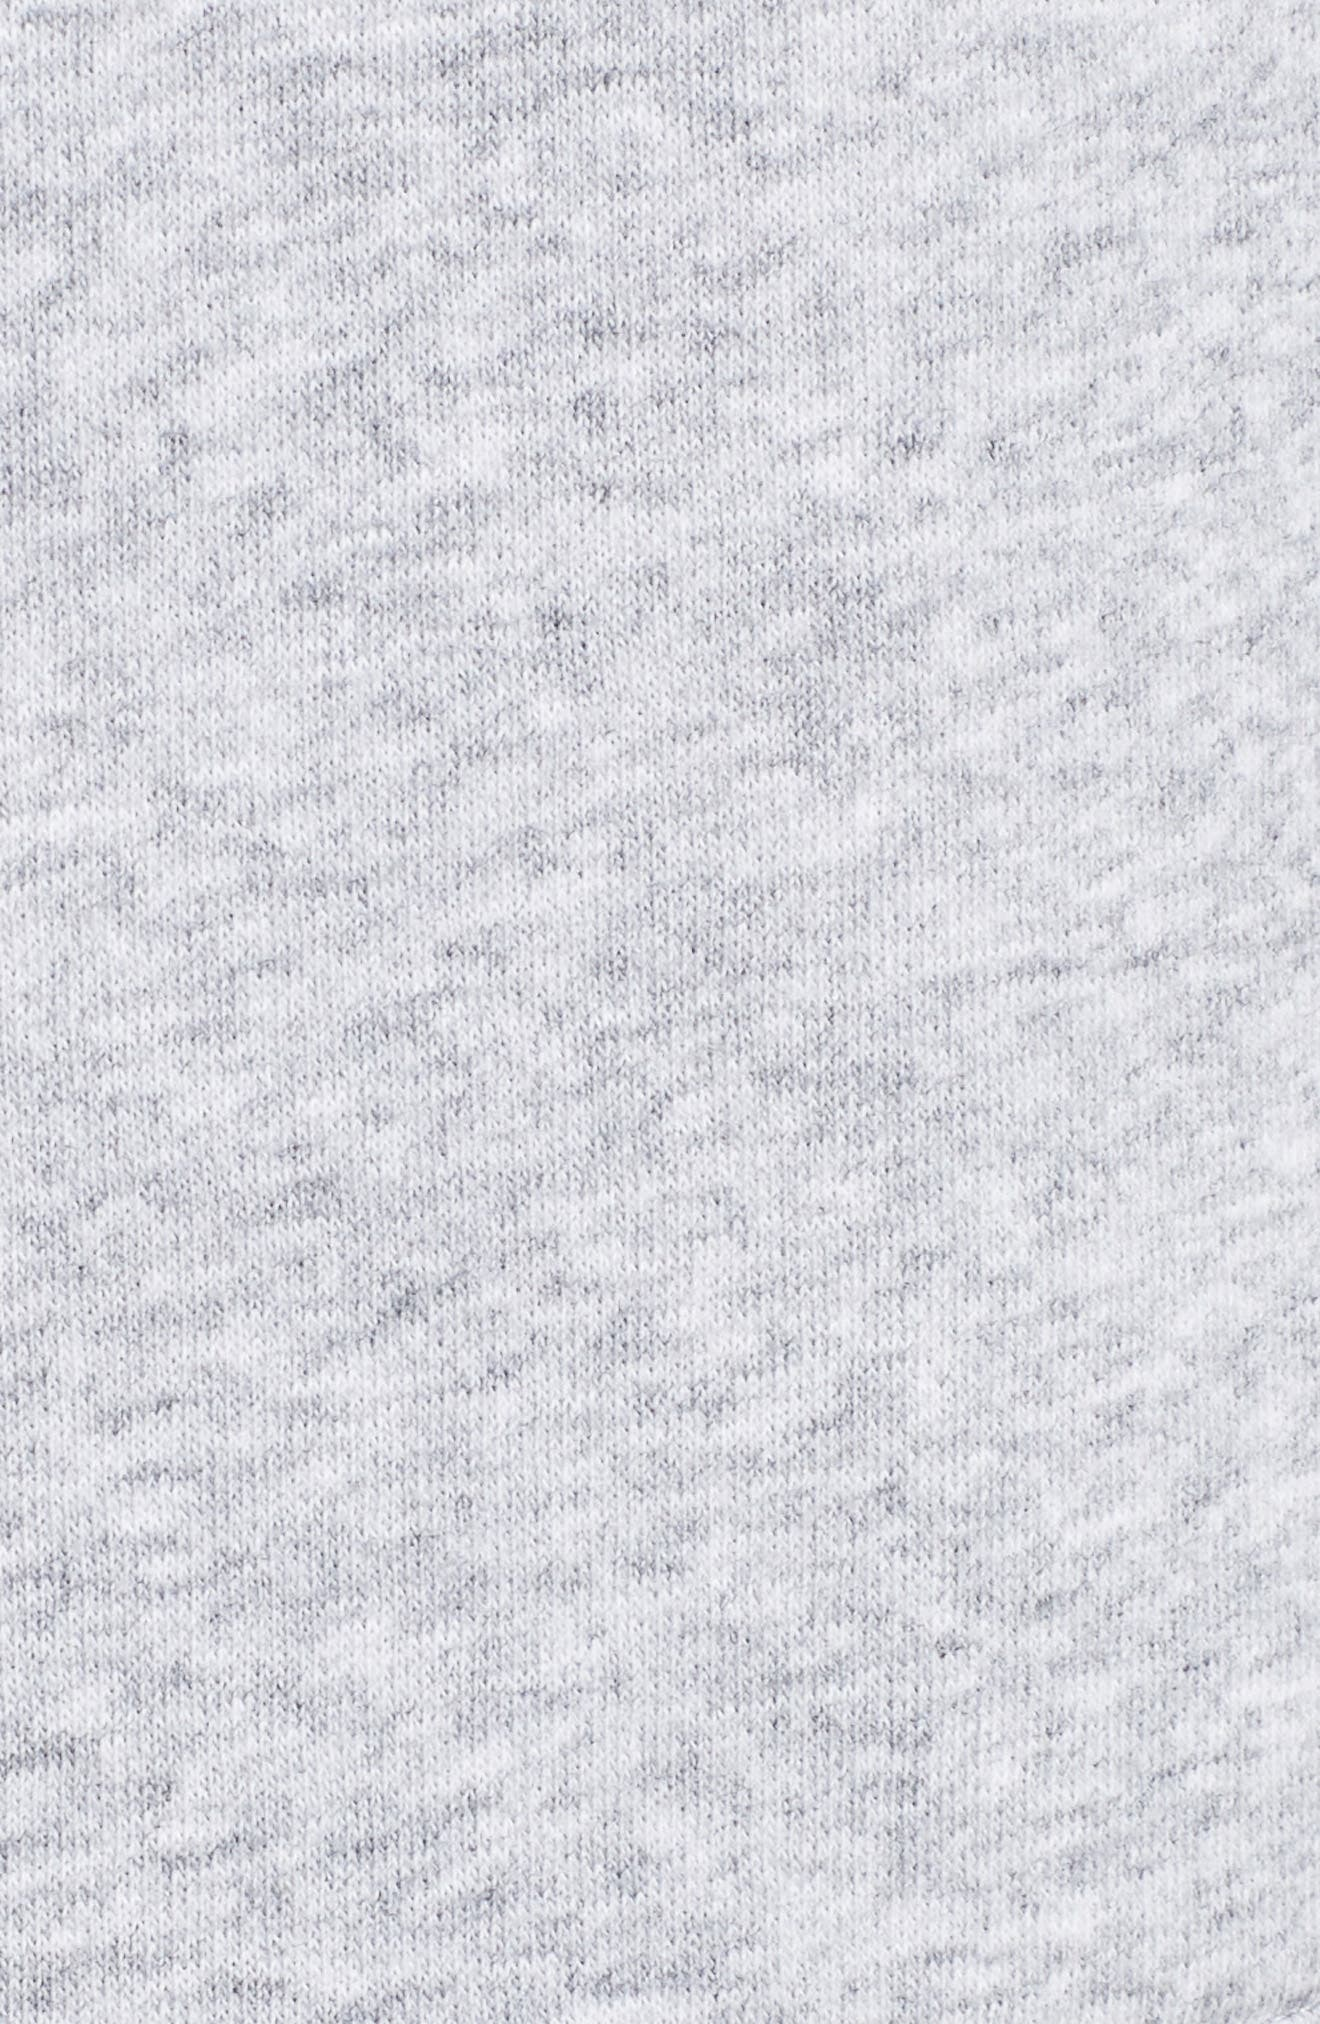 Off Duty Sweatshirt,                             Alternate thumbnail 5, color,                             026